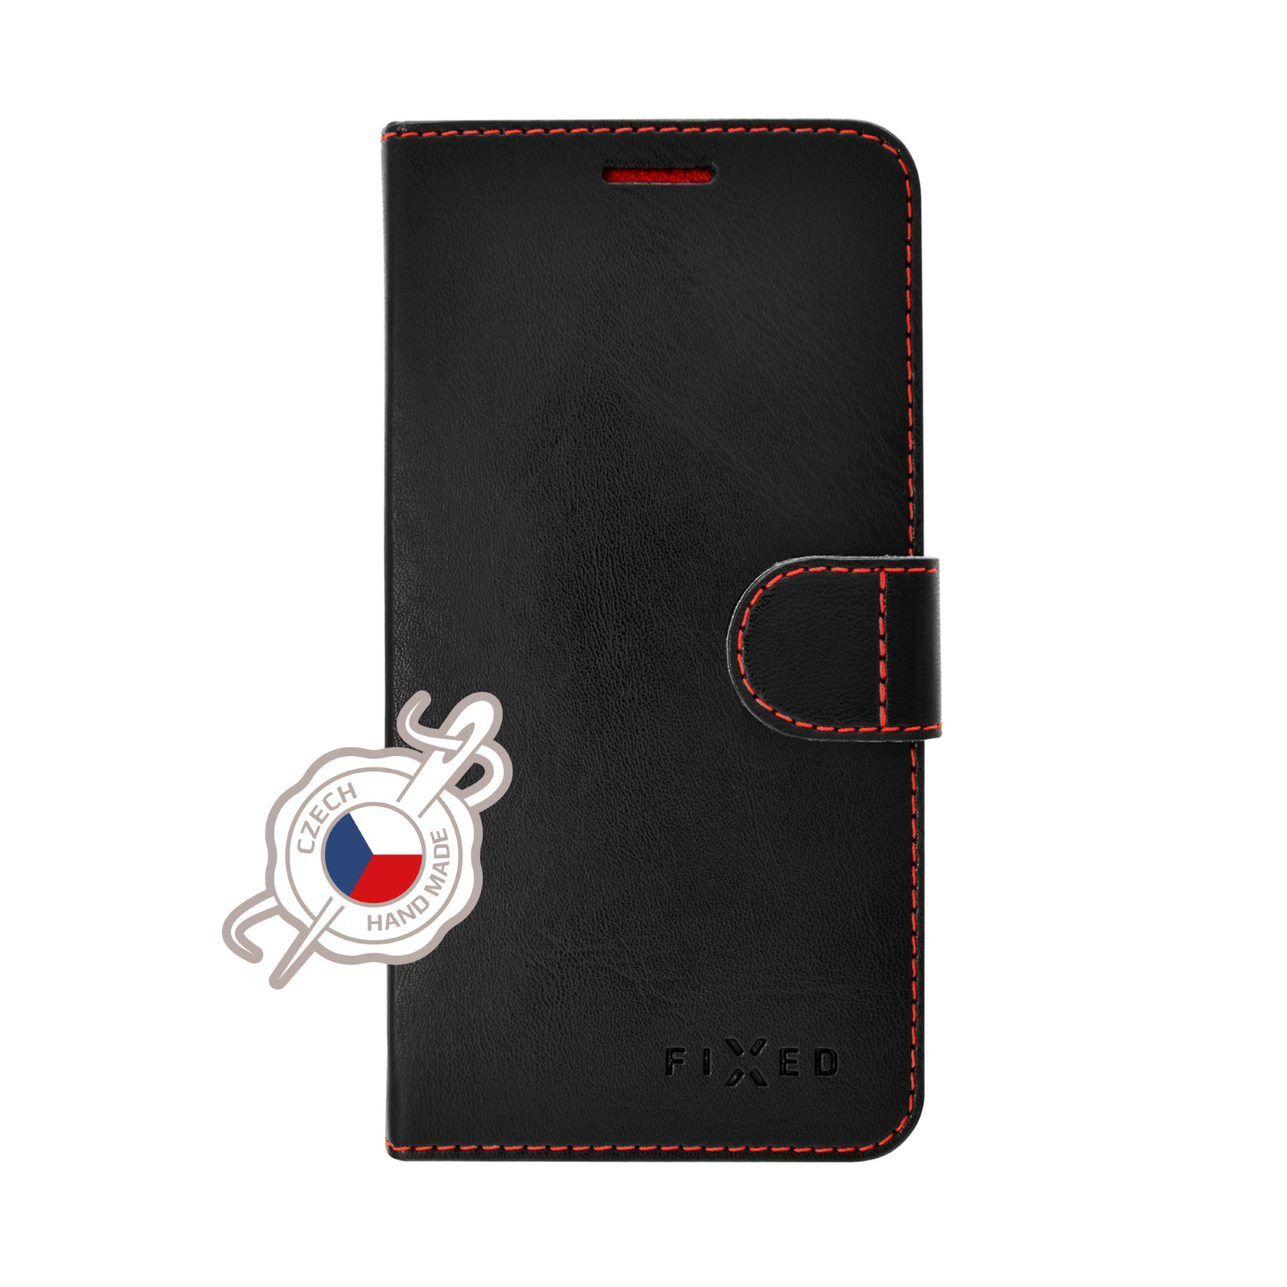 FIXED FIT flipové pouzdro pro Apple iPhone 7 Plus/8 Plus, černé